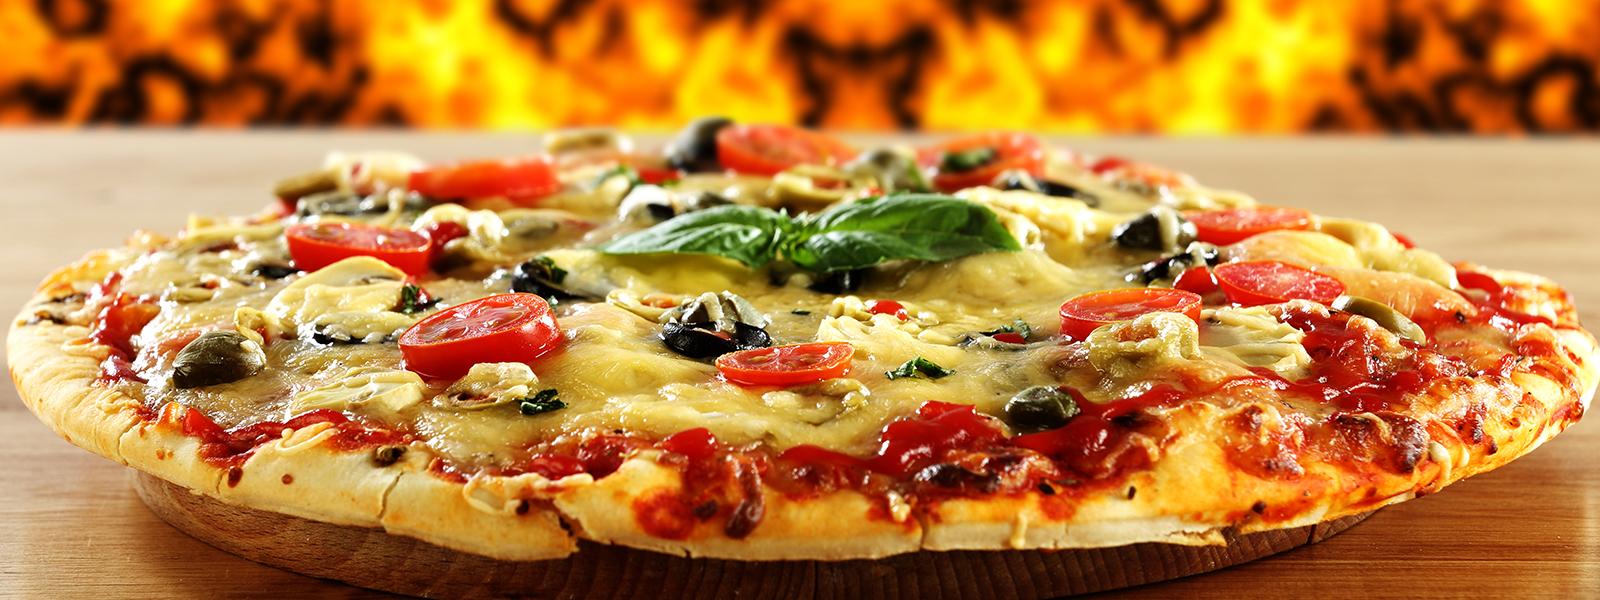 Tasty Tasty Takeaway Online Ordering In Hartlepool